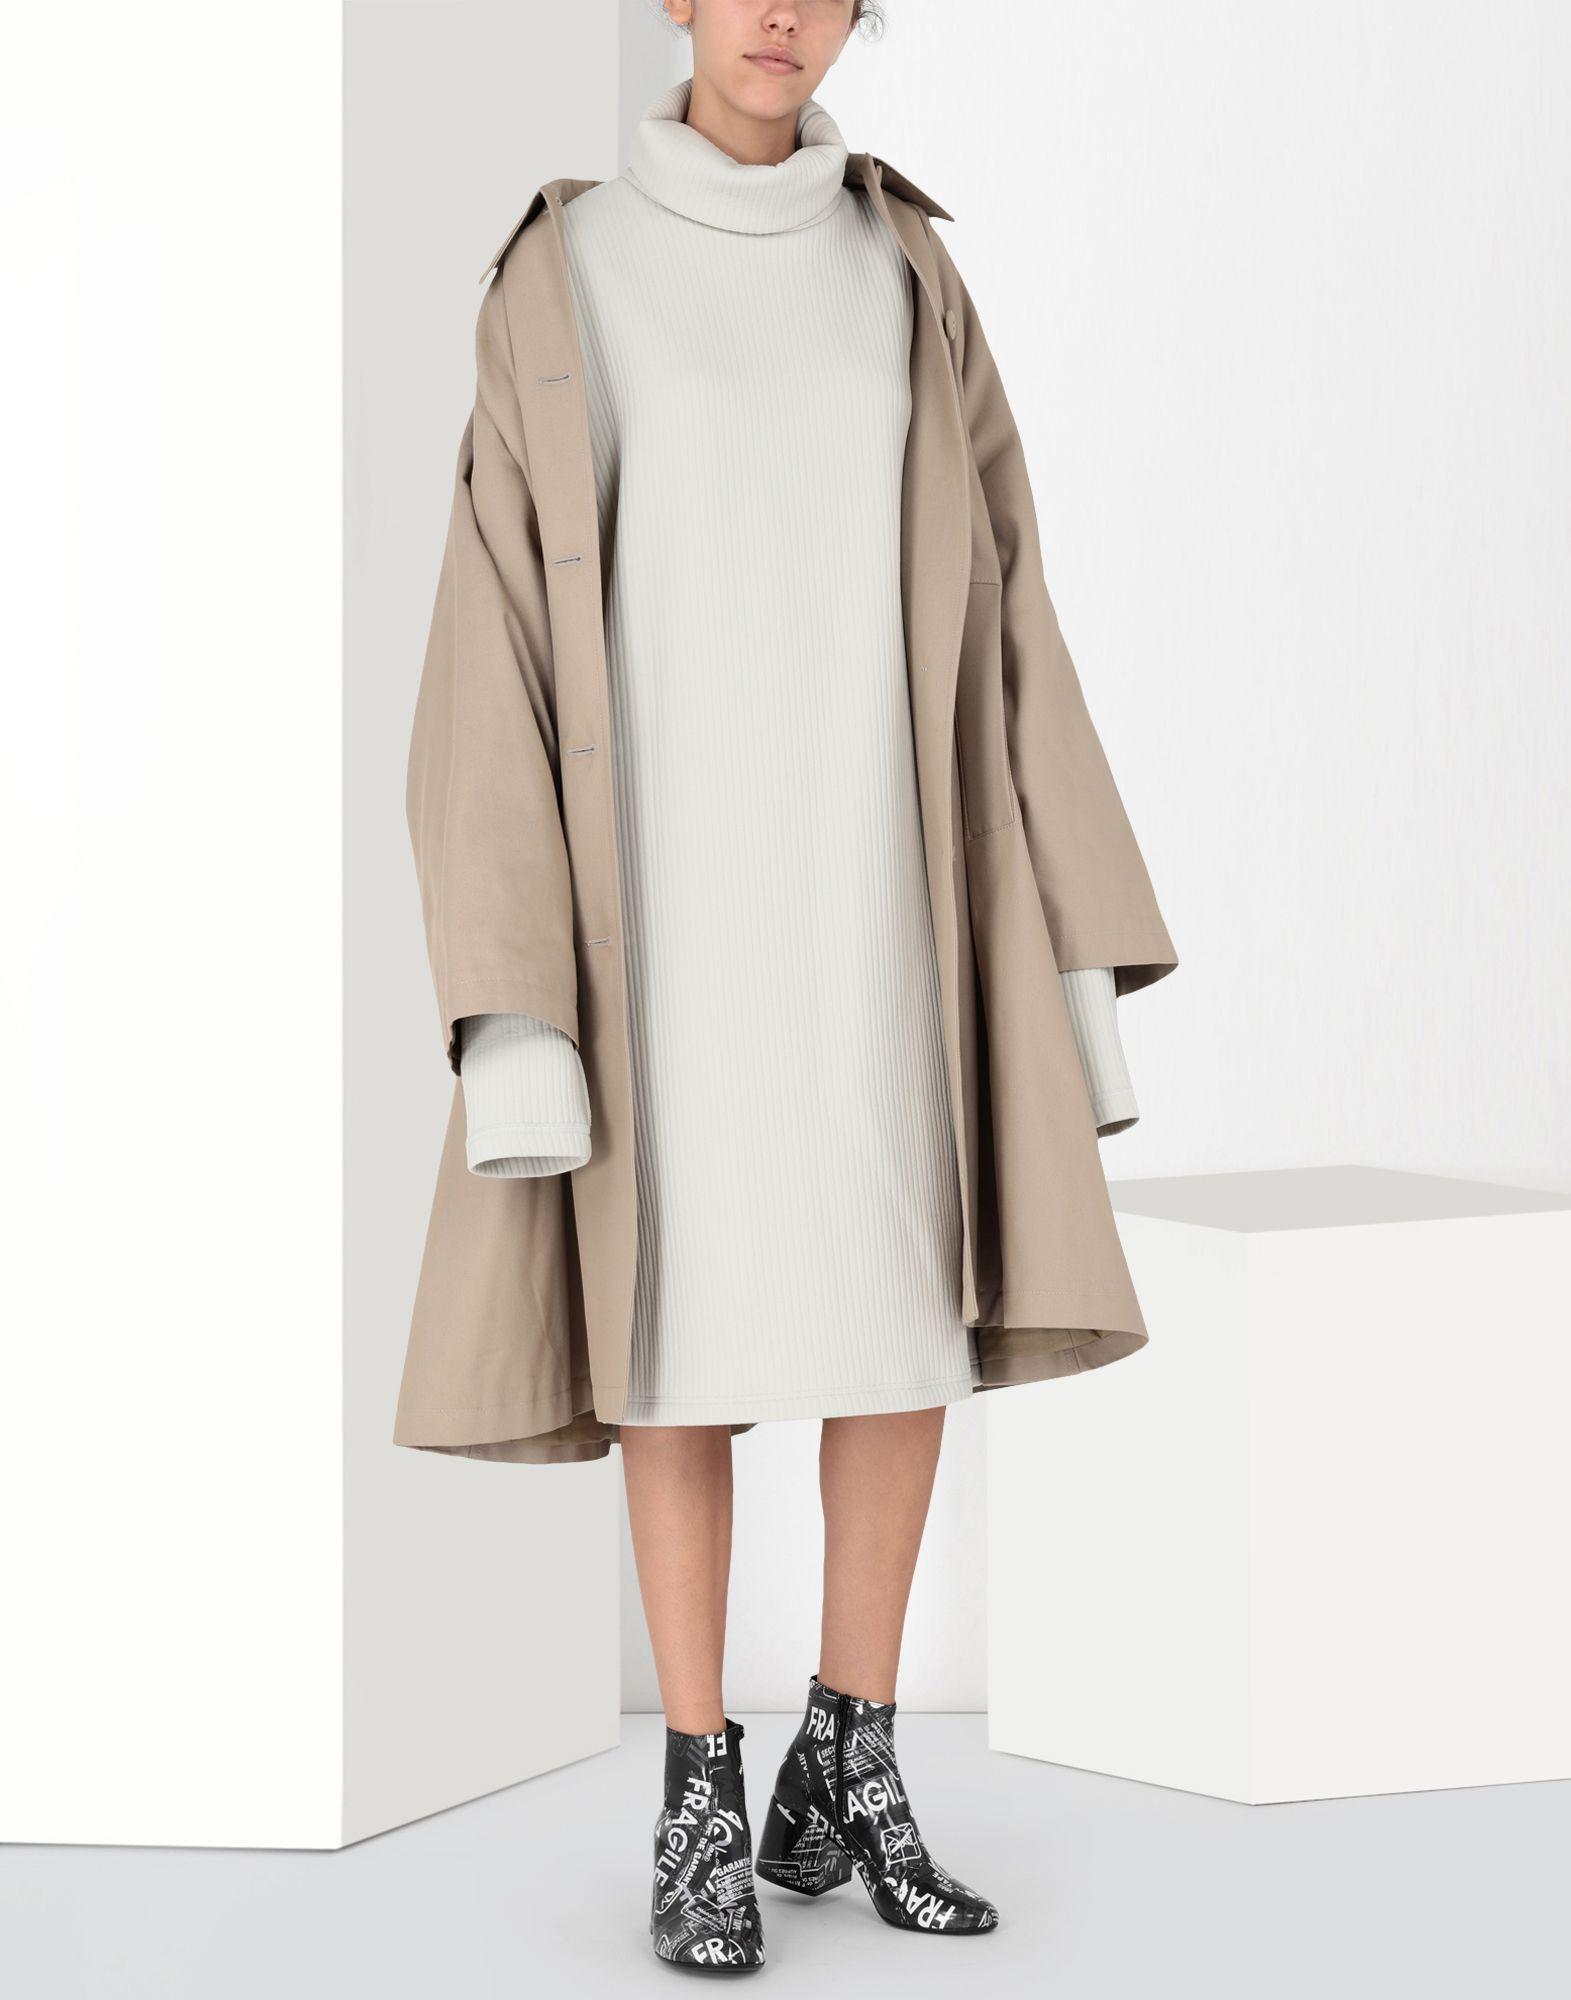 MM6 MAISON MARGIELA Ribbed jersey dress 3/4 length dress Woman r